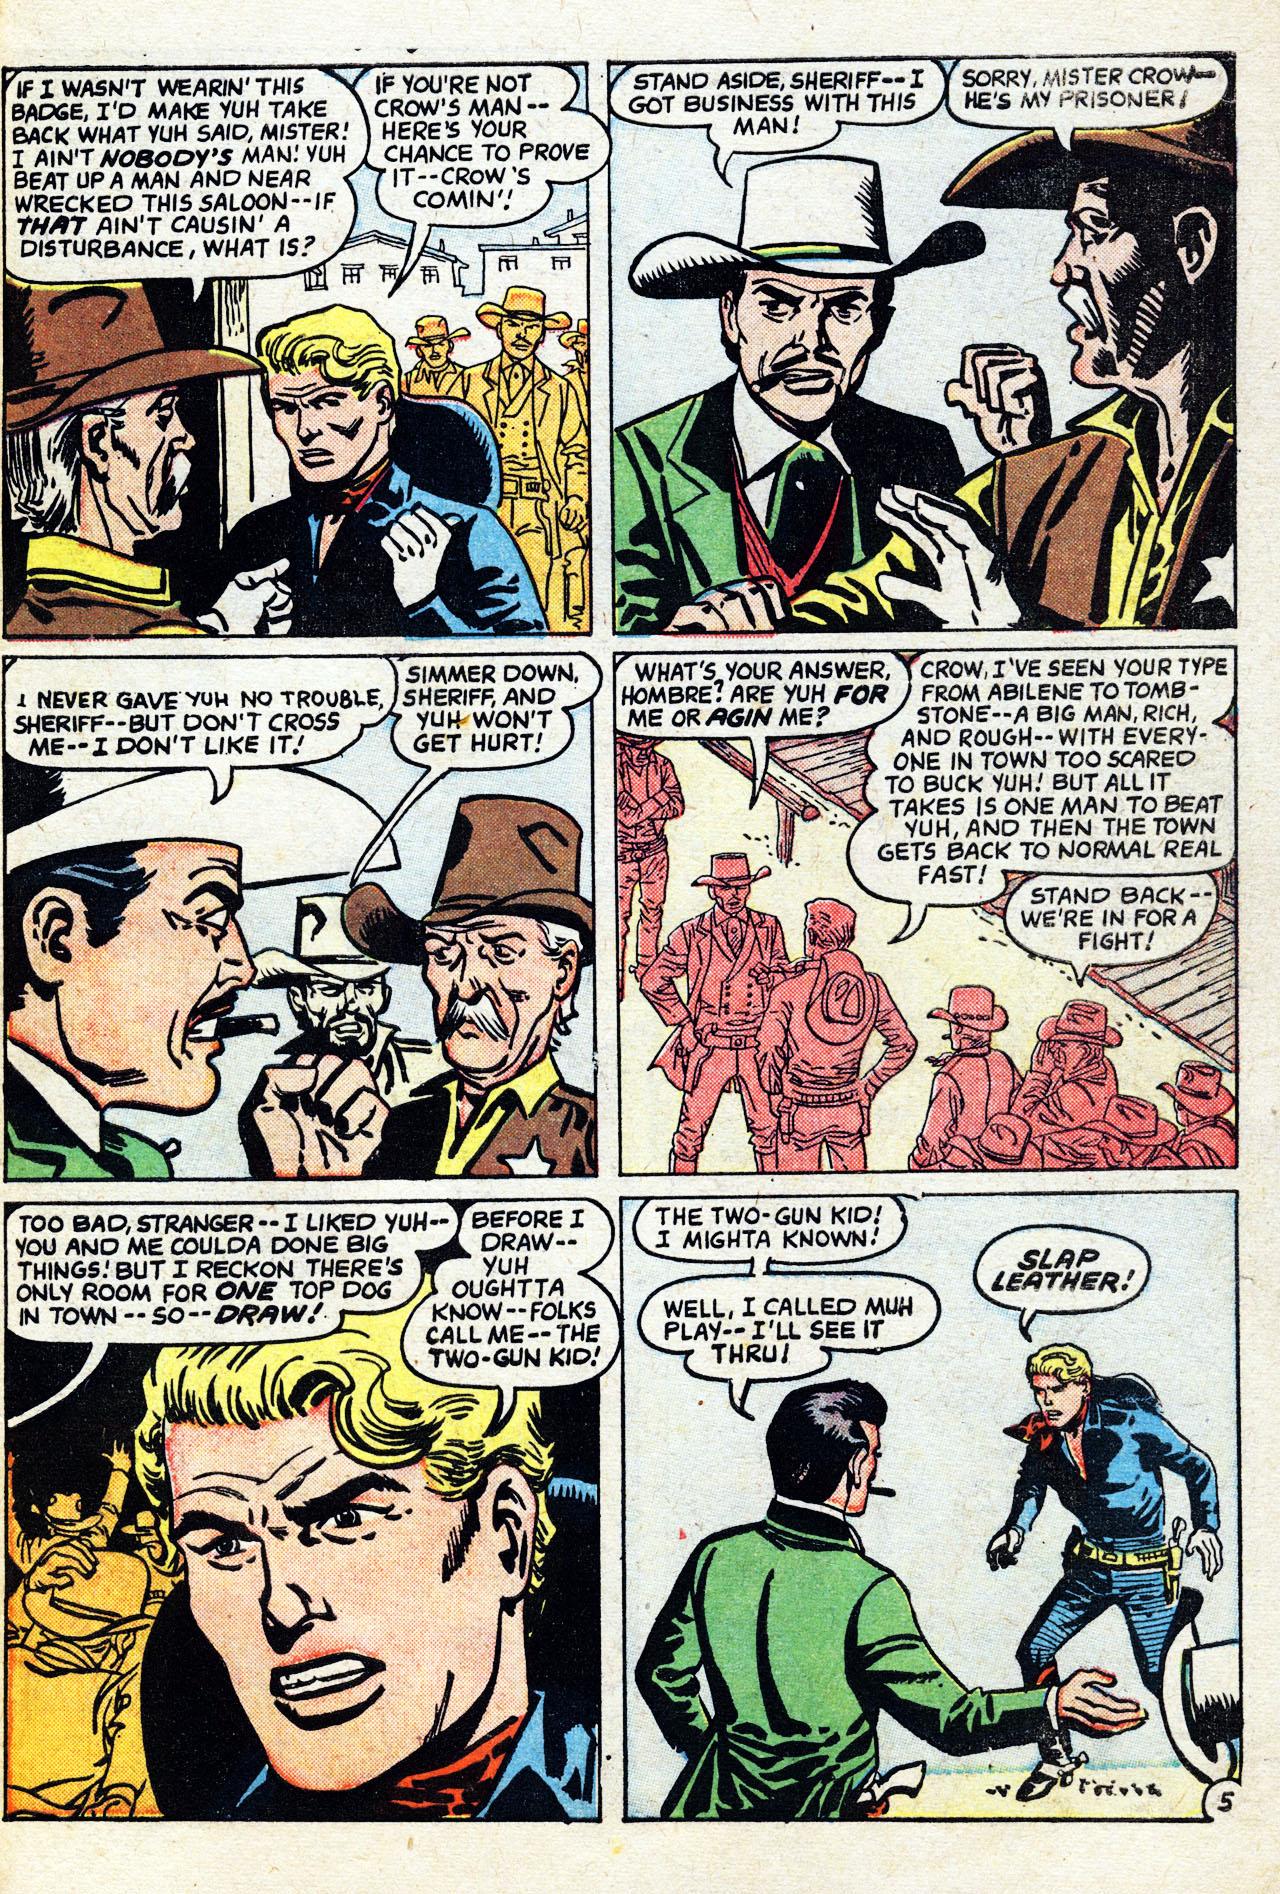 Read online Two-Gun Kid comic -  Issue #41 - 31